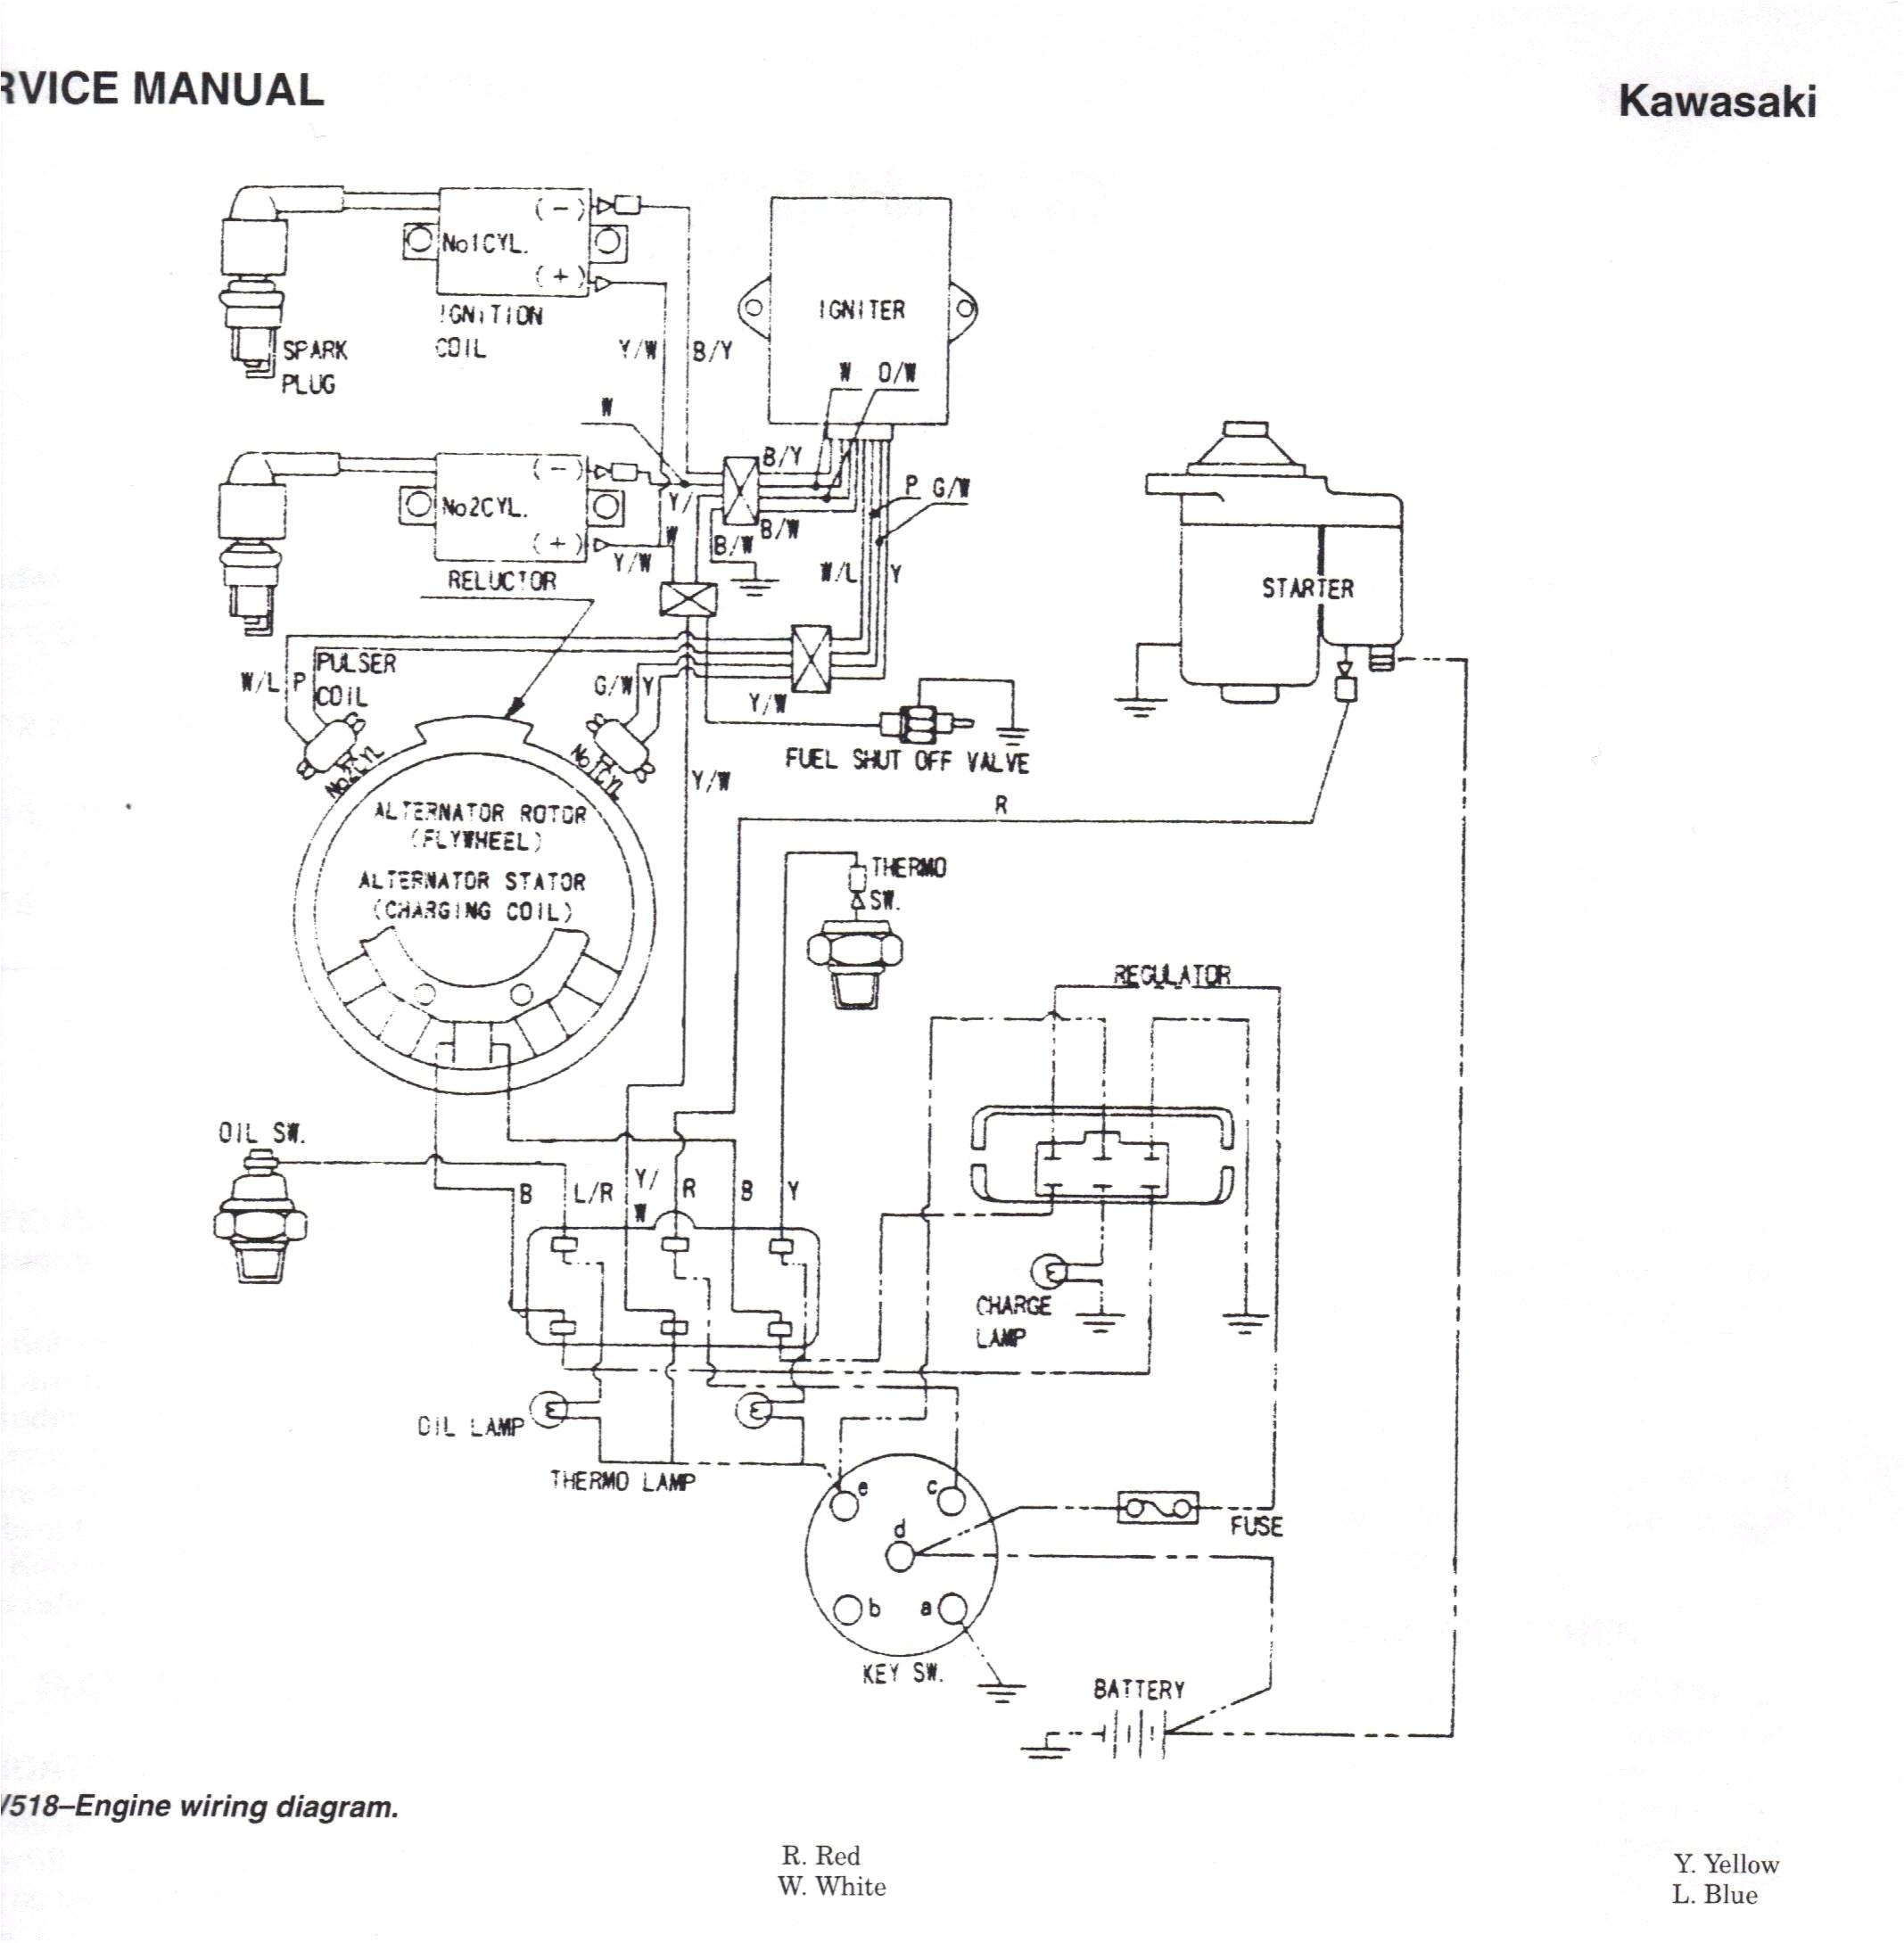 deere x300 wiring diagram wiring diagram centre x300 wiring diagram john deere john deere electrical diagram